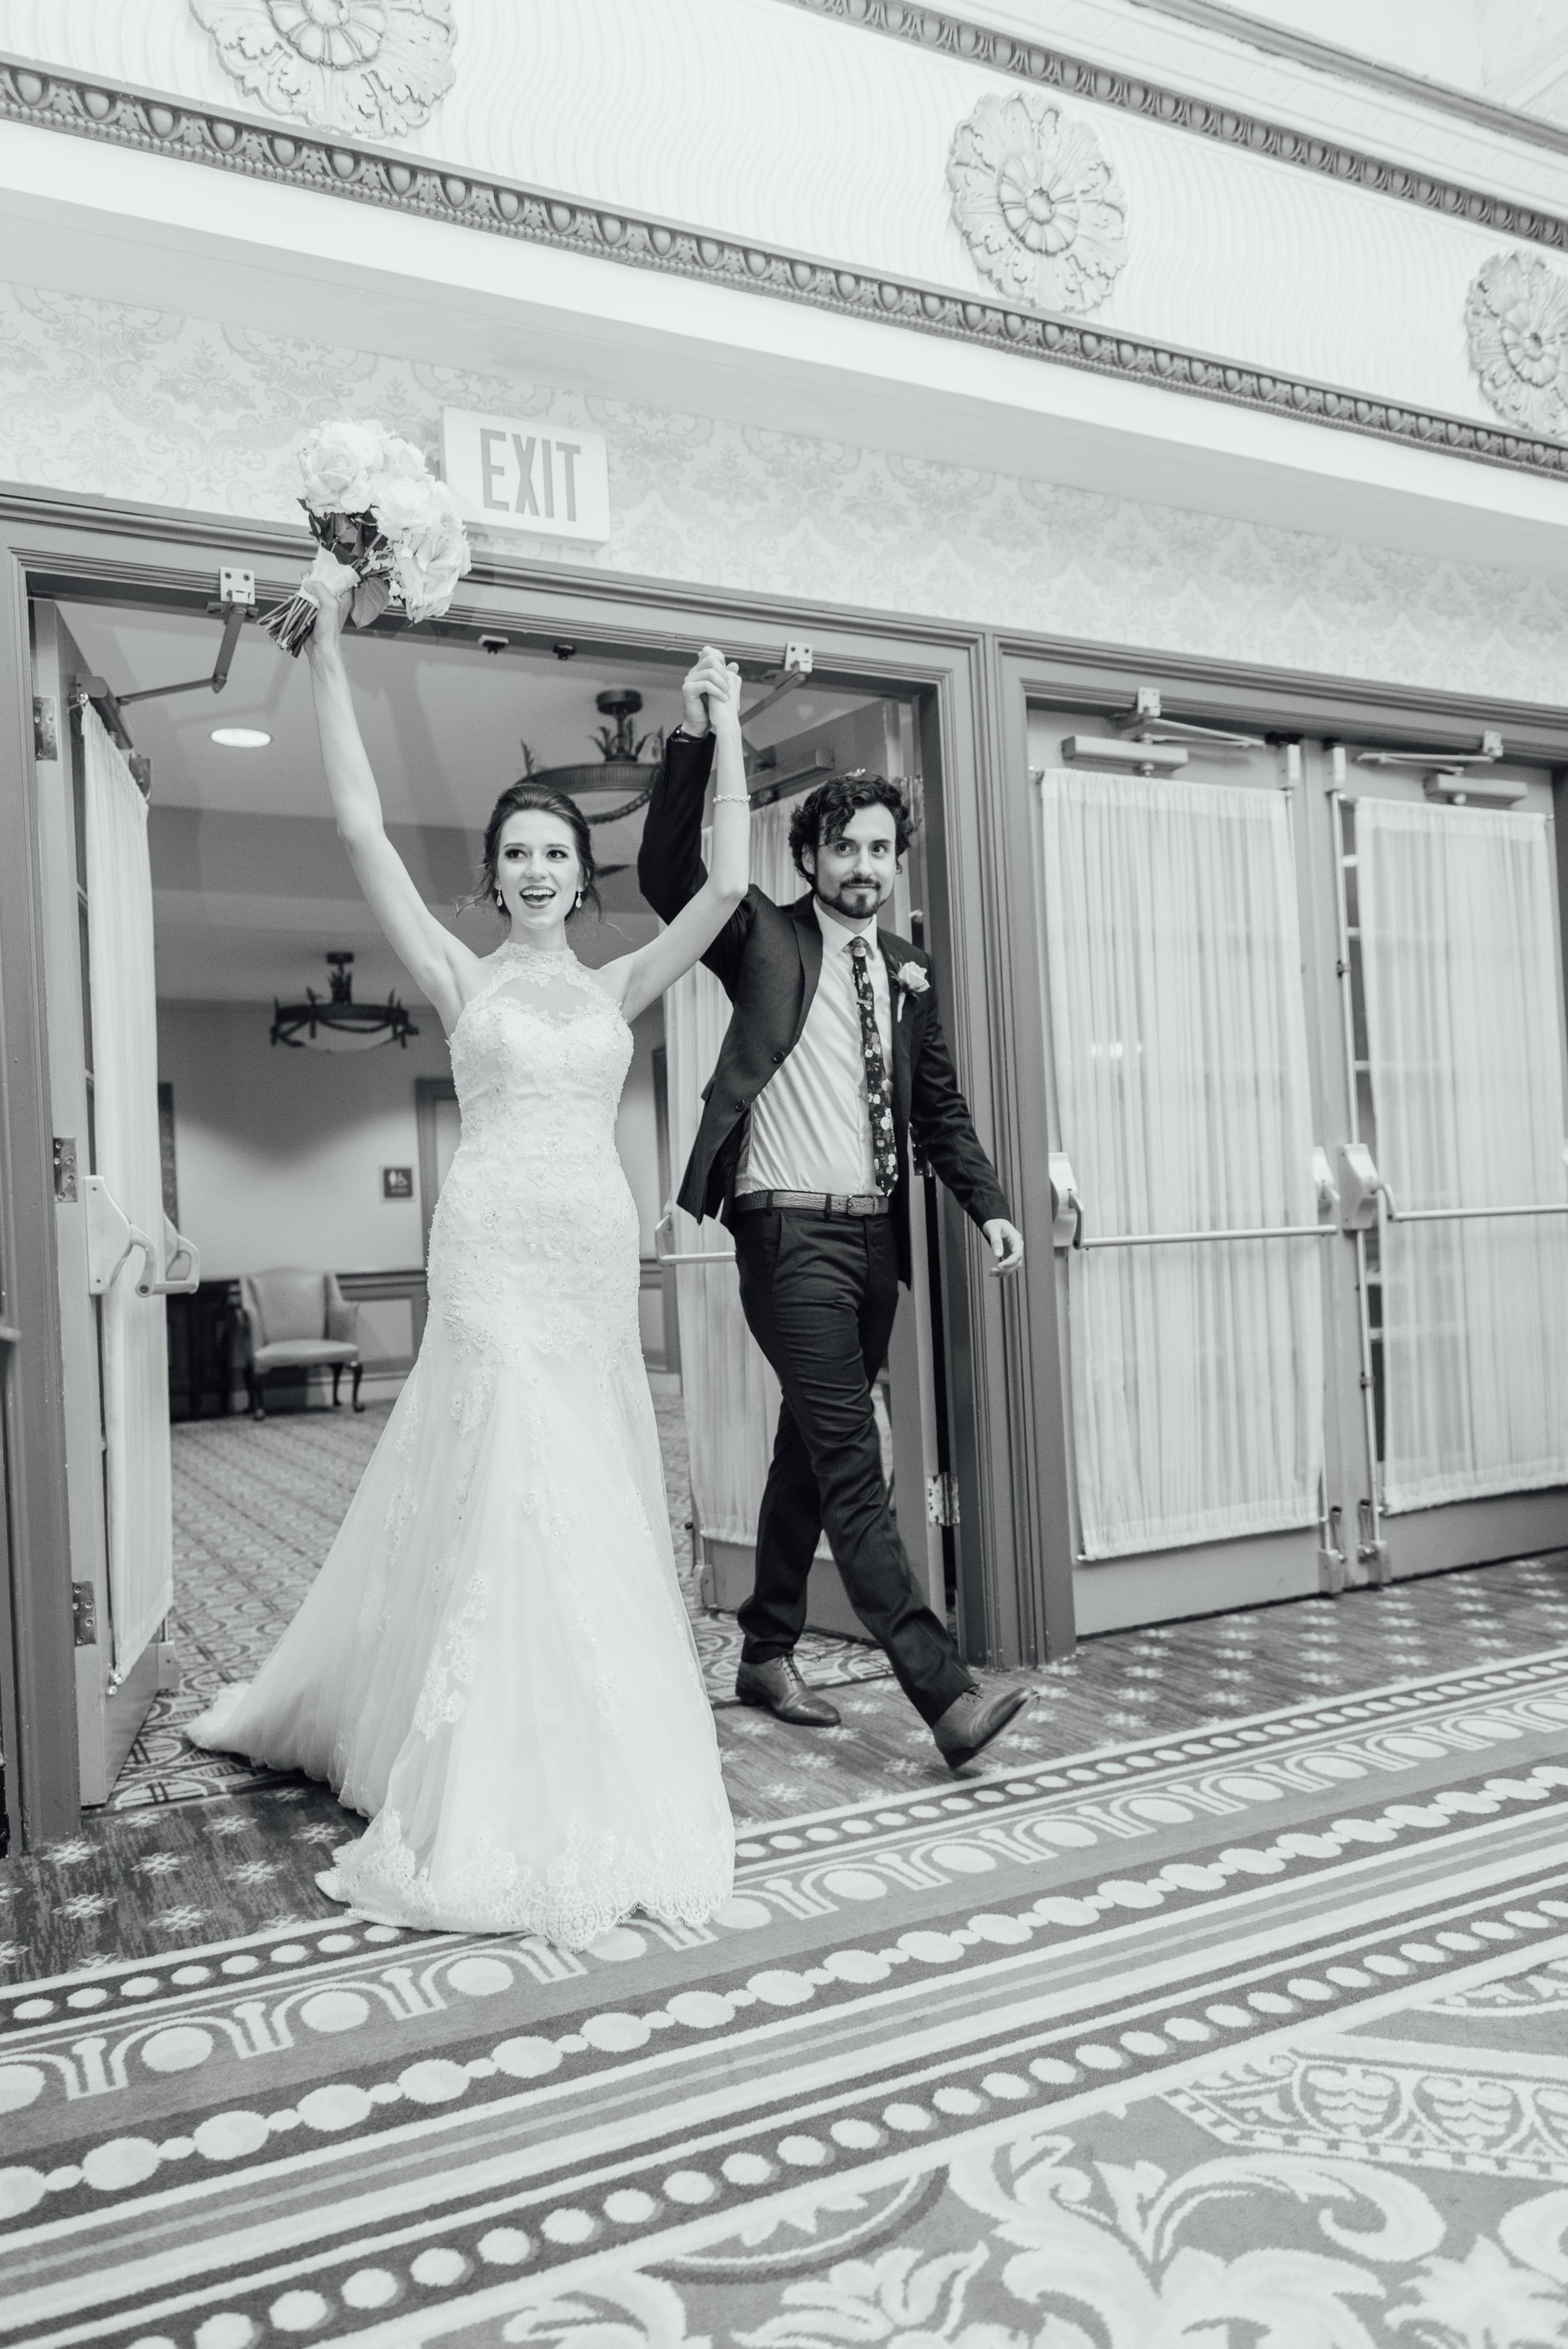 cleland-studios-wedding-photography-50.jpg